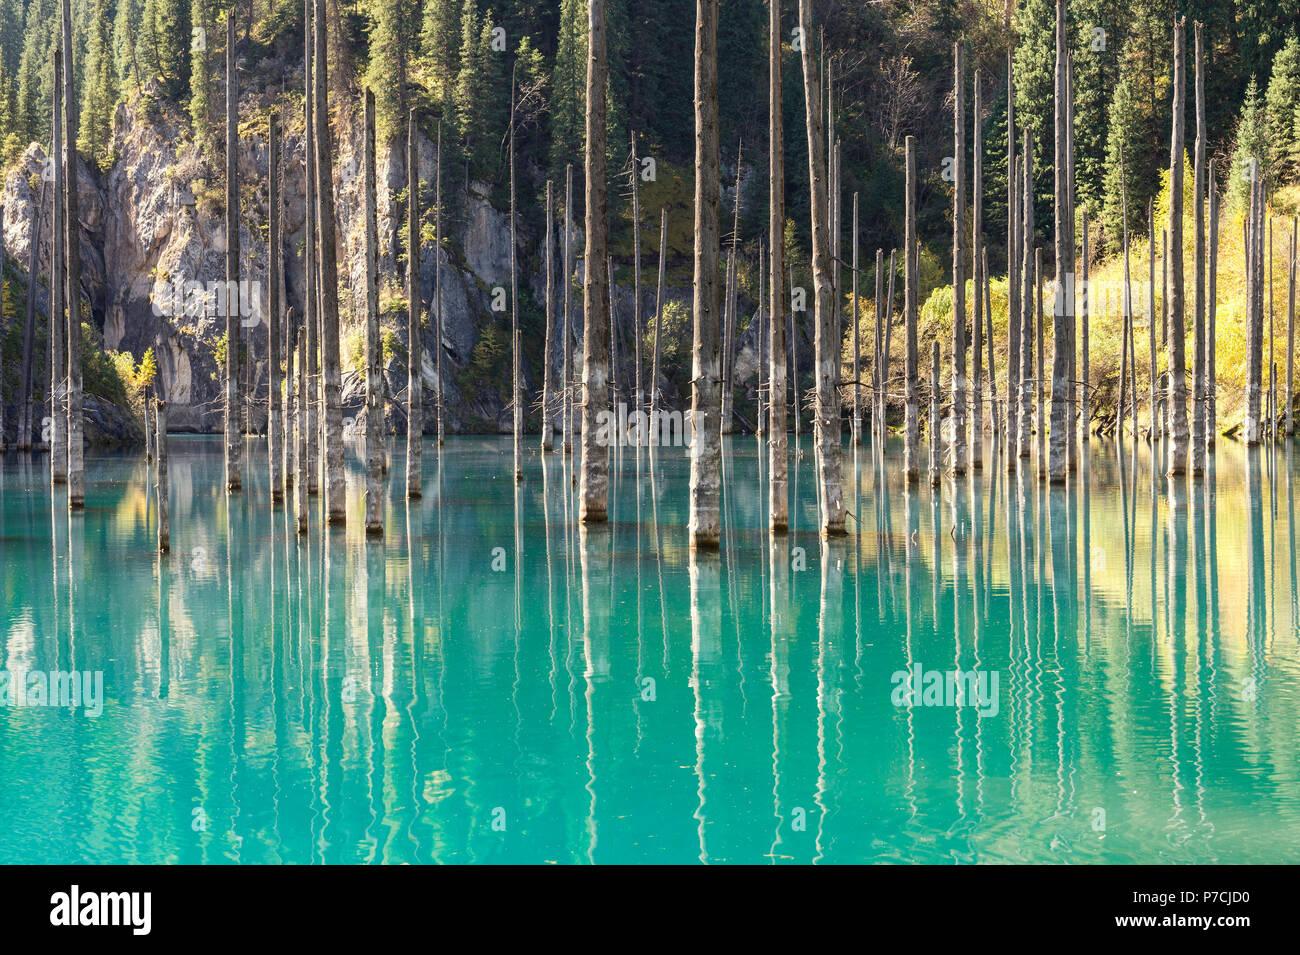 Dried trunks of Picea schrenkiana, Kaindy lake, Birch Tree Lake or Submerged Forest, Tien Shan Mountains, Kazakhstan - Stock Image